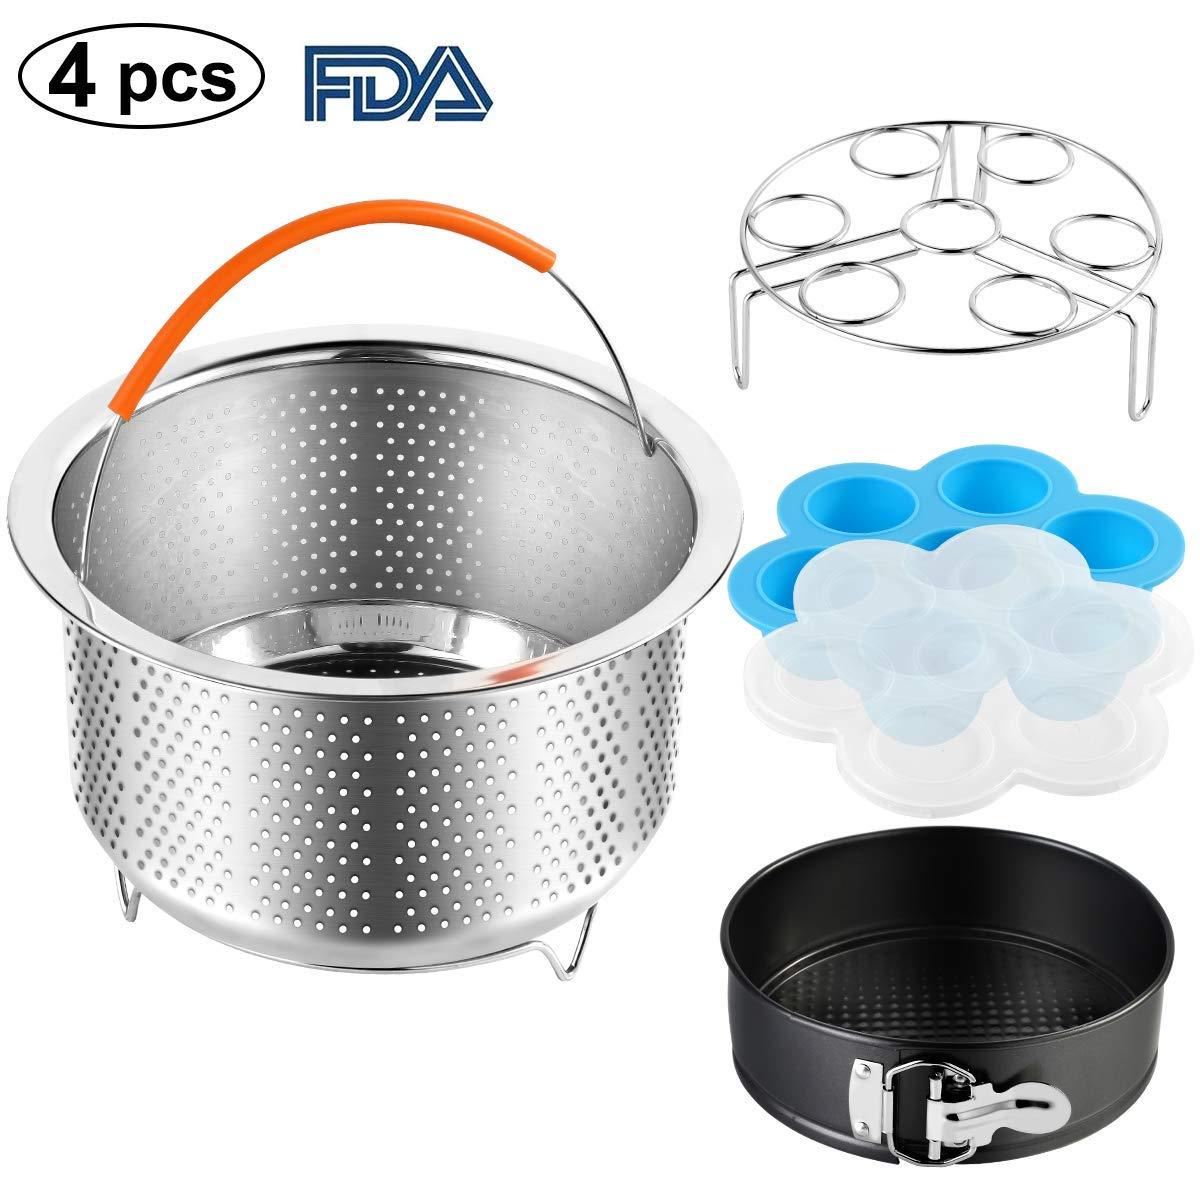 Accessories Set Compatible Instant Pot-Fits 6, 8Qt Instant Pot Pressure Cooker, 4-Pcs with Steamer Basket, Egg Steamer Rack, Silicone Egg Bites Mold, Non-Stick Springform Pan, Best Gift Idea